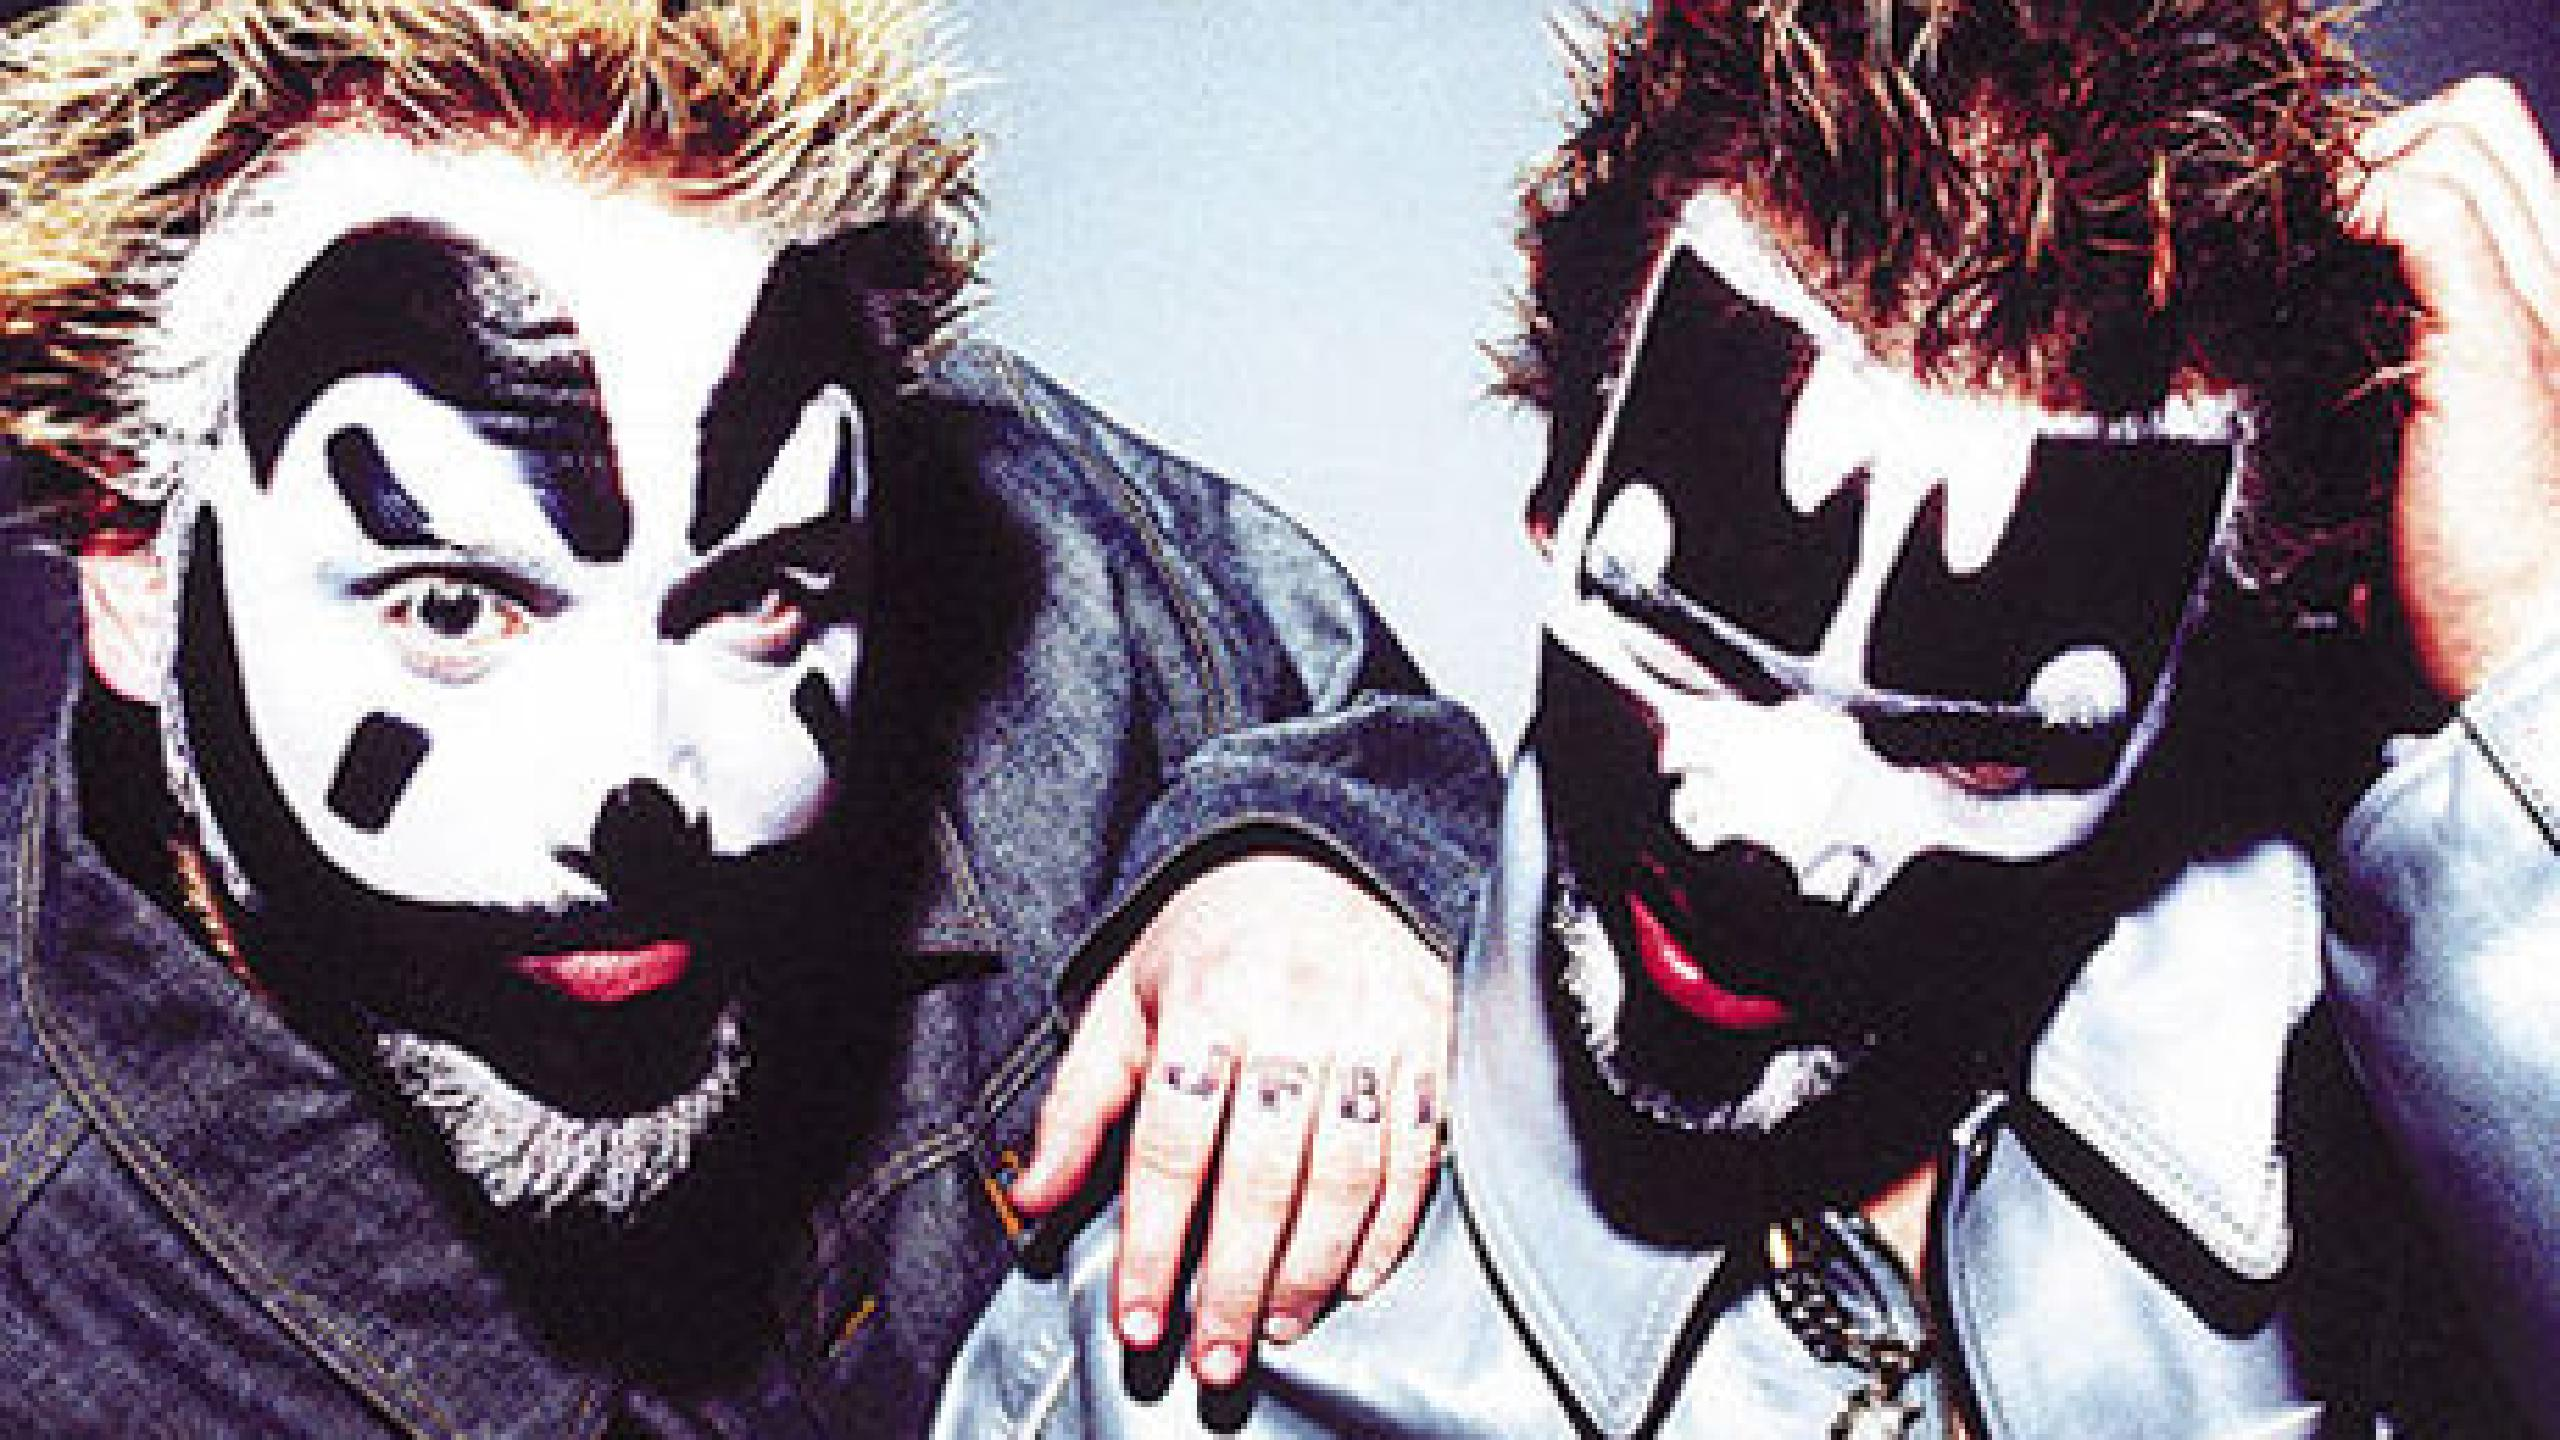 Insane Clown Posse Tour 2020 Insane Clown Posse tour dates 2019 2020. Insane Clown Posse